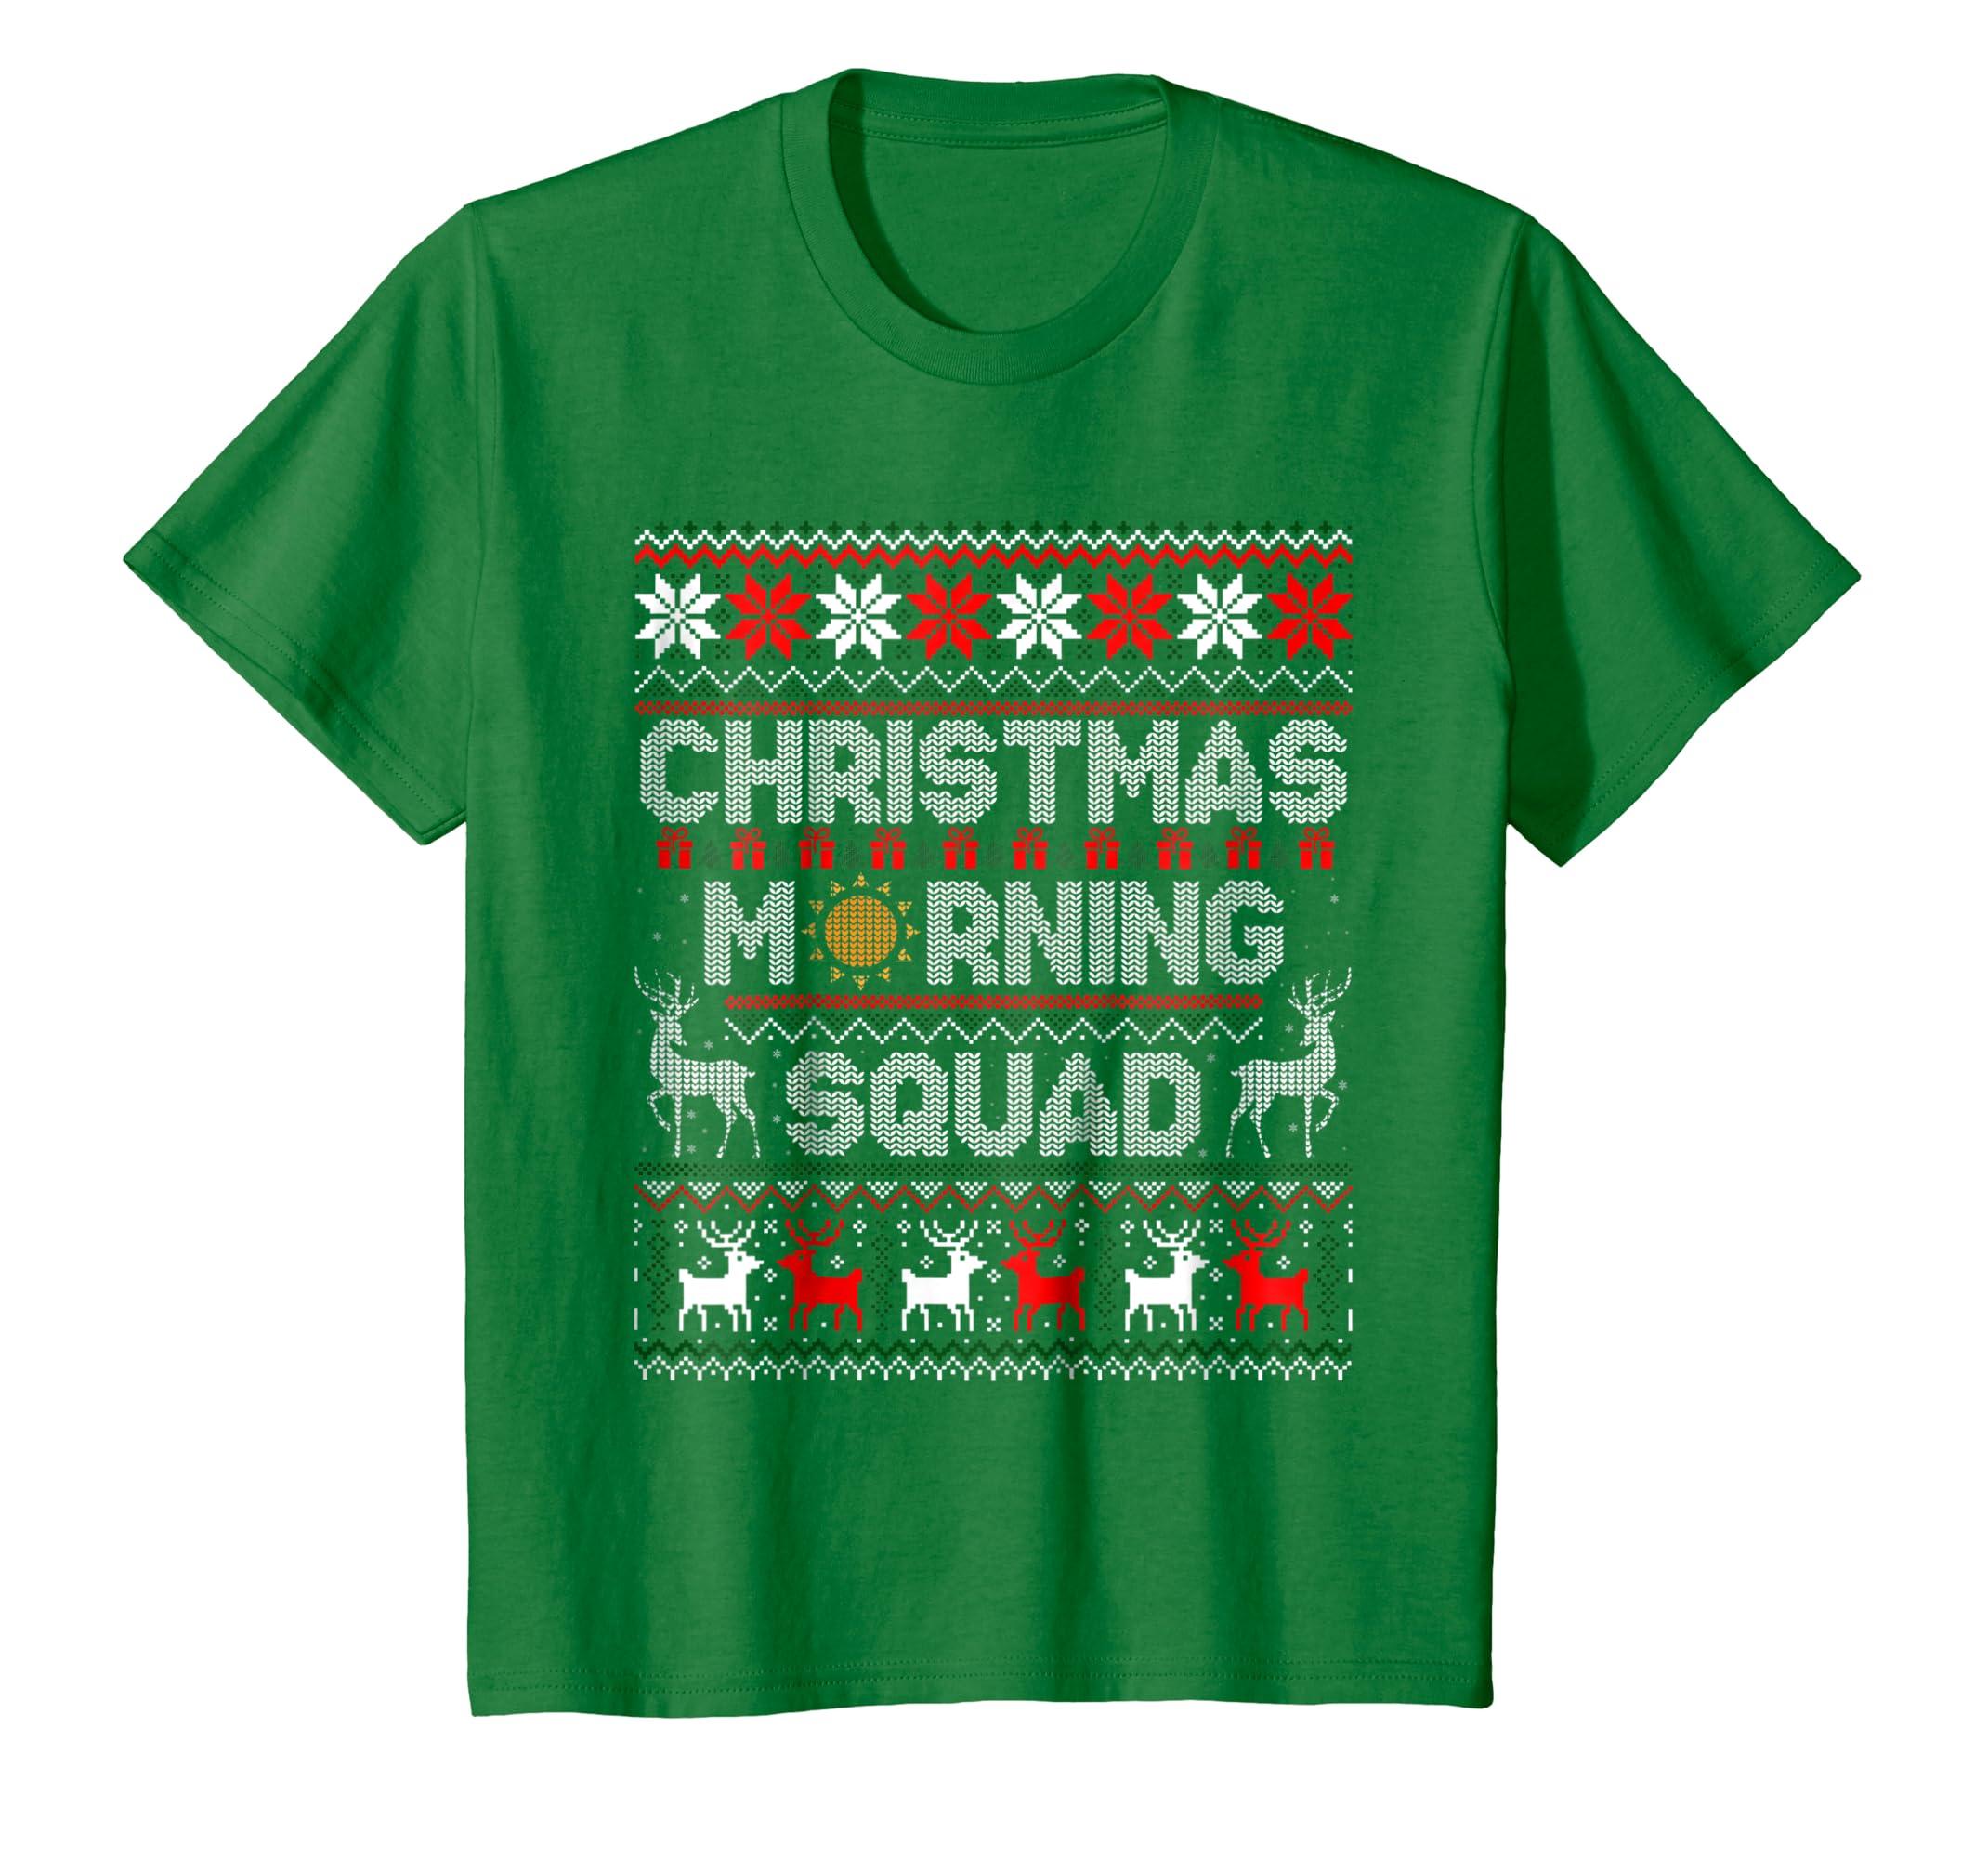 30abc945f01fd Amazon.com: Christmas Morning Squad Ugly Xmas Sweaters Shirt: Clothing